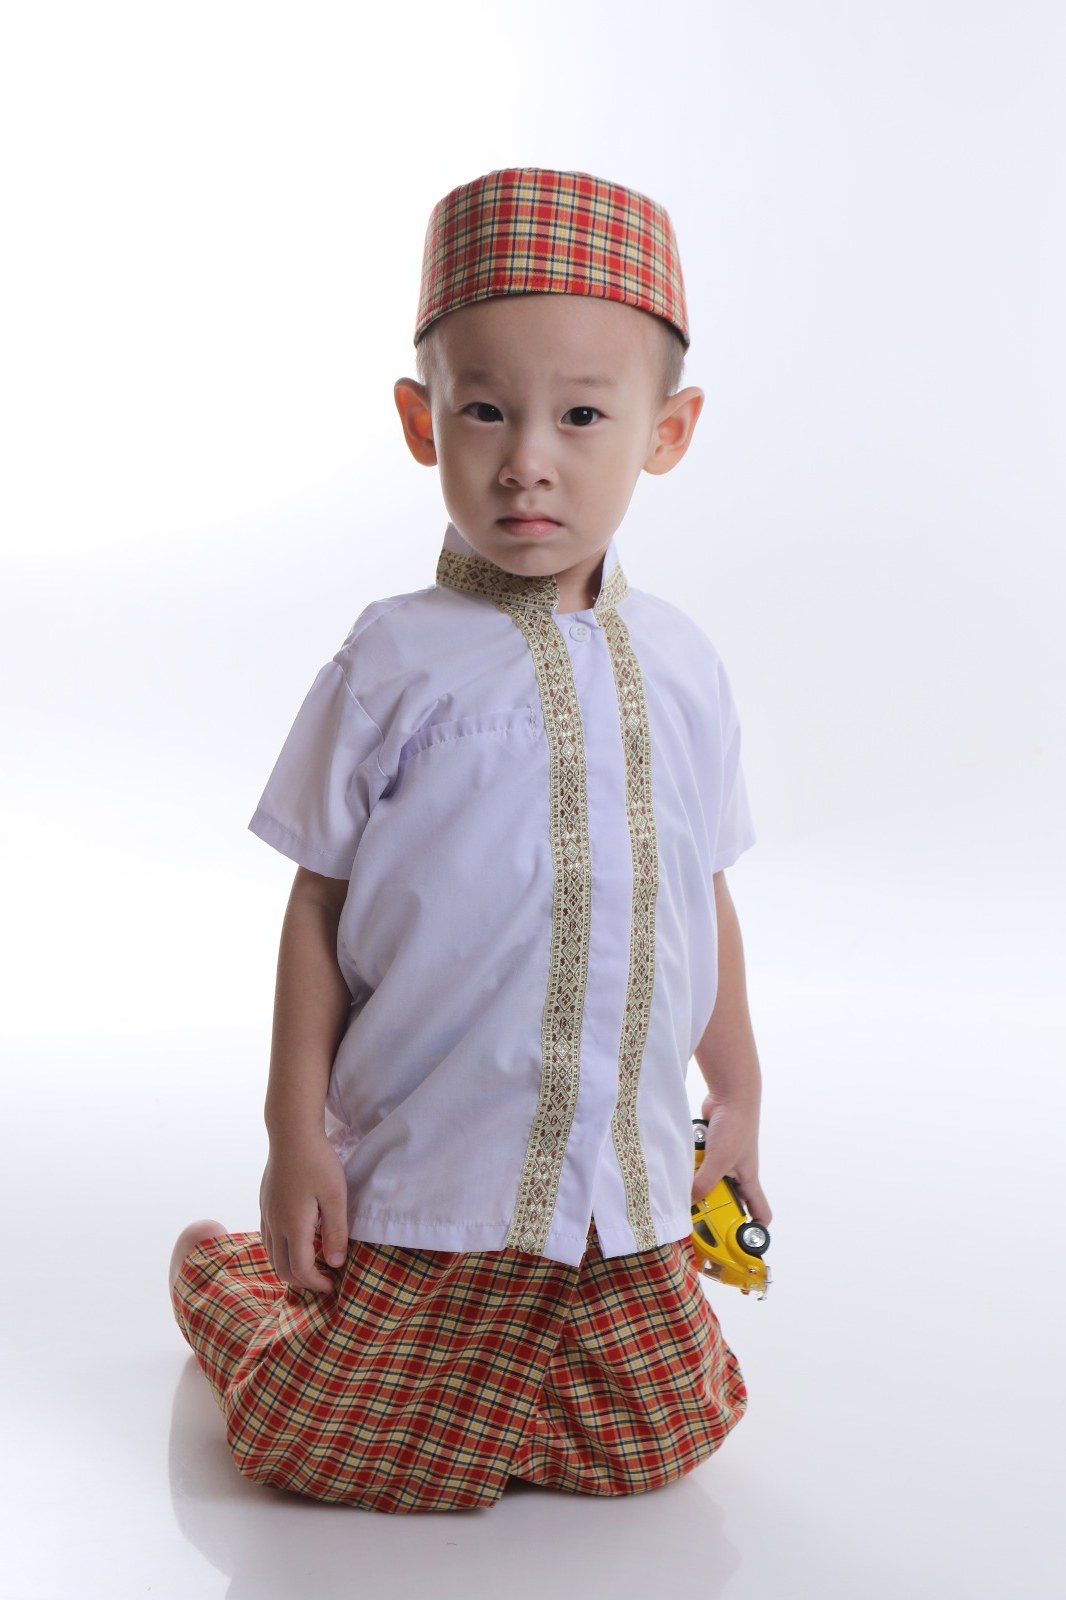 Design Baju Lebaran 2018 Anak Laki Laki Budm Model Baju Muslim Untuk Anak Laki Laki Desain Terbaru